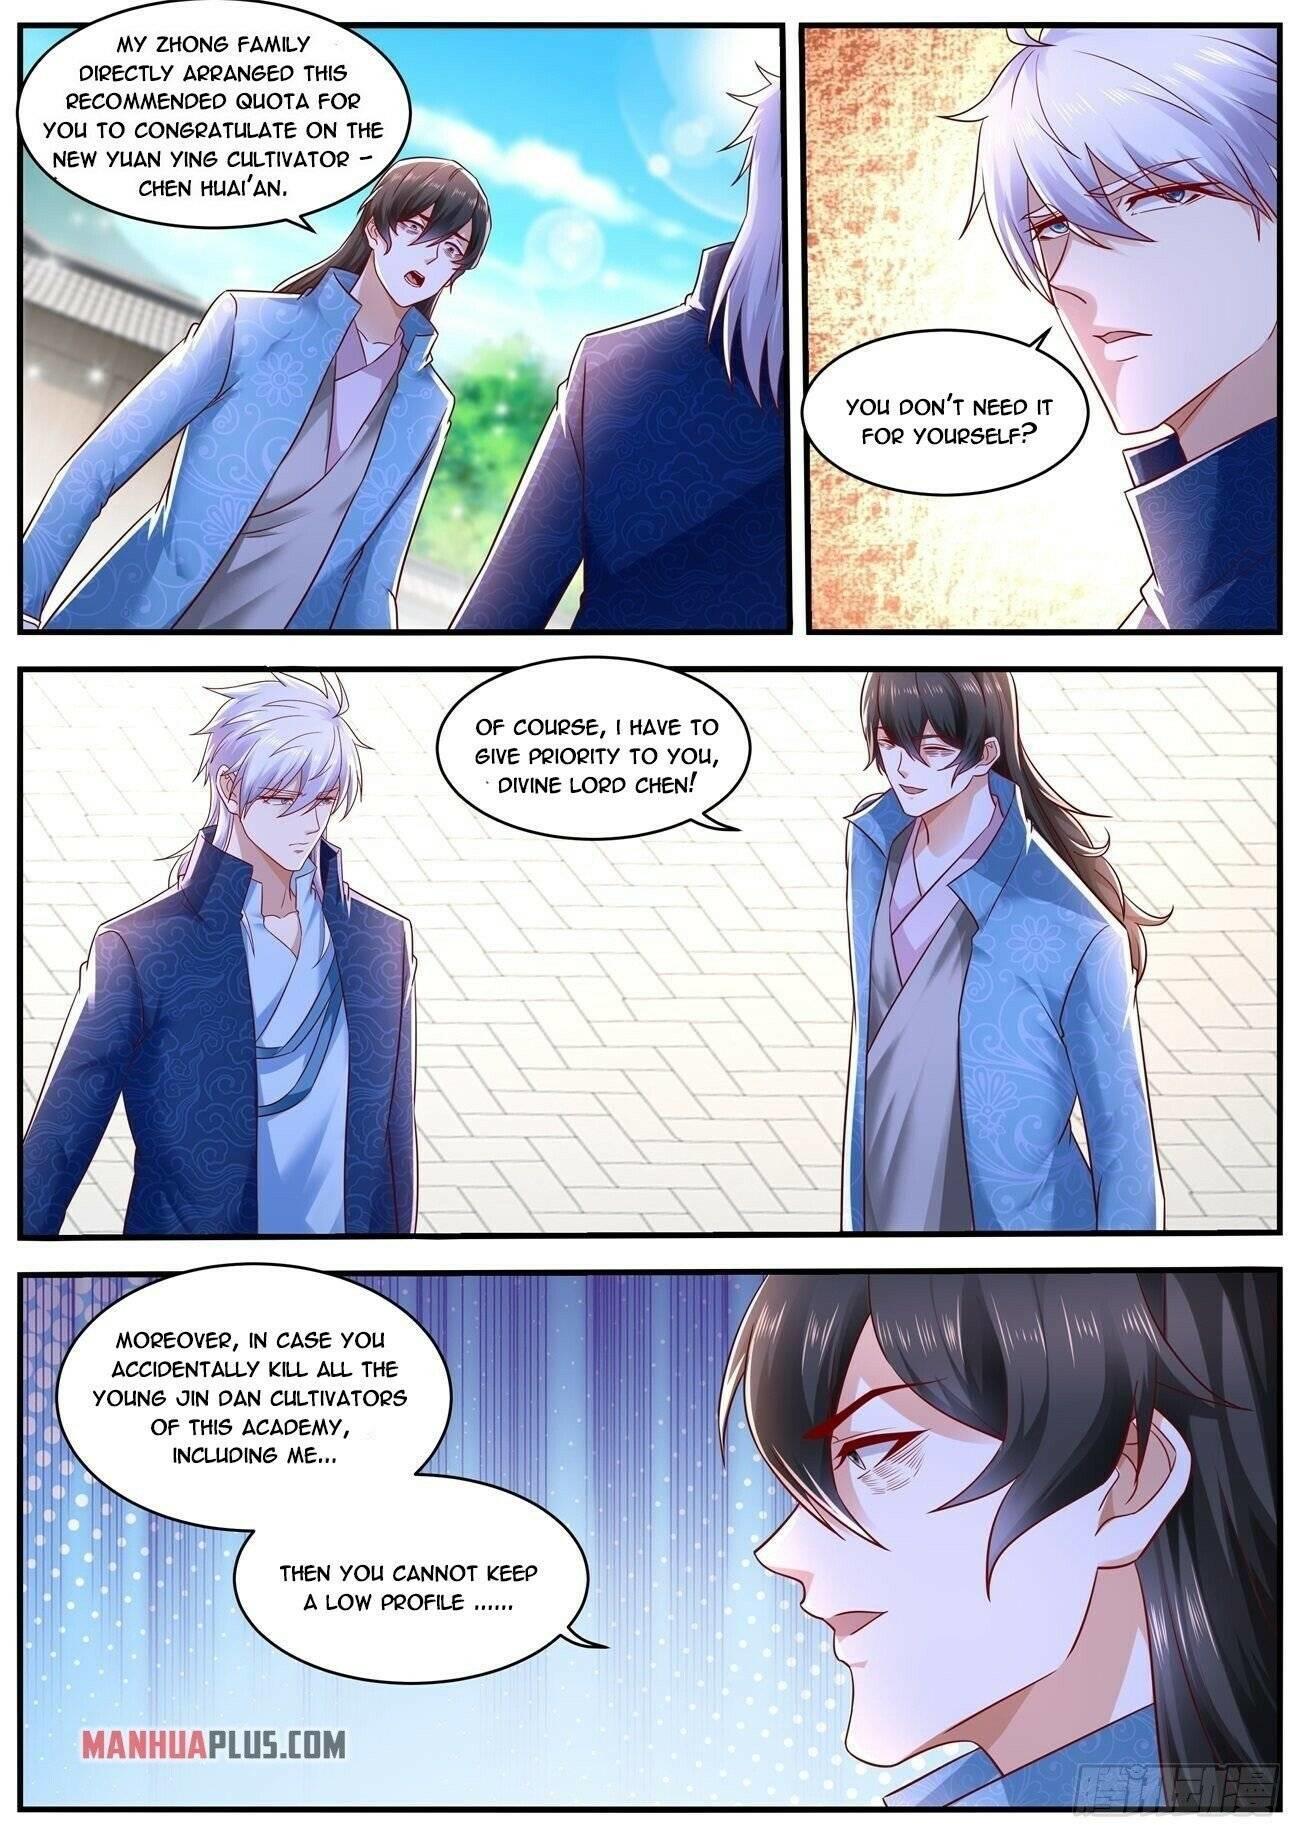 Rebirth Of The Urban Immortal Cultivator Chapter 656 page 2 - Mangakakalot